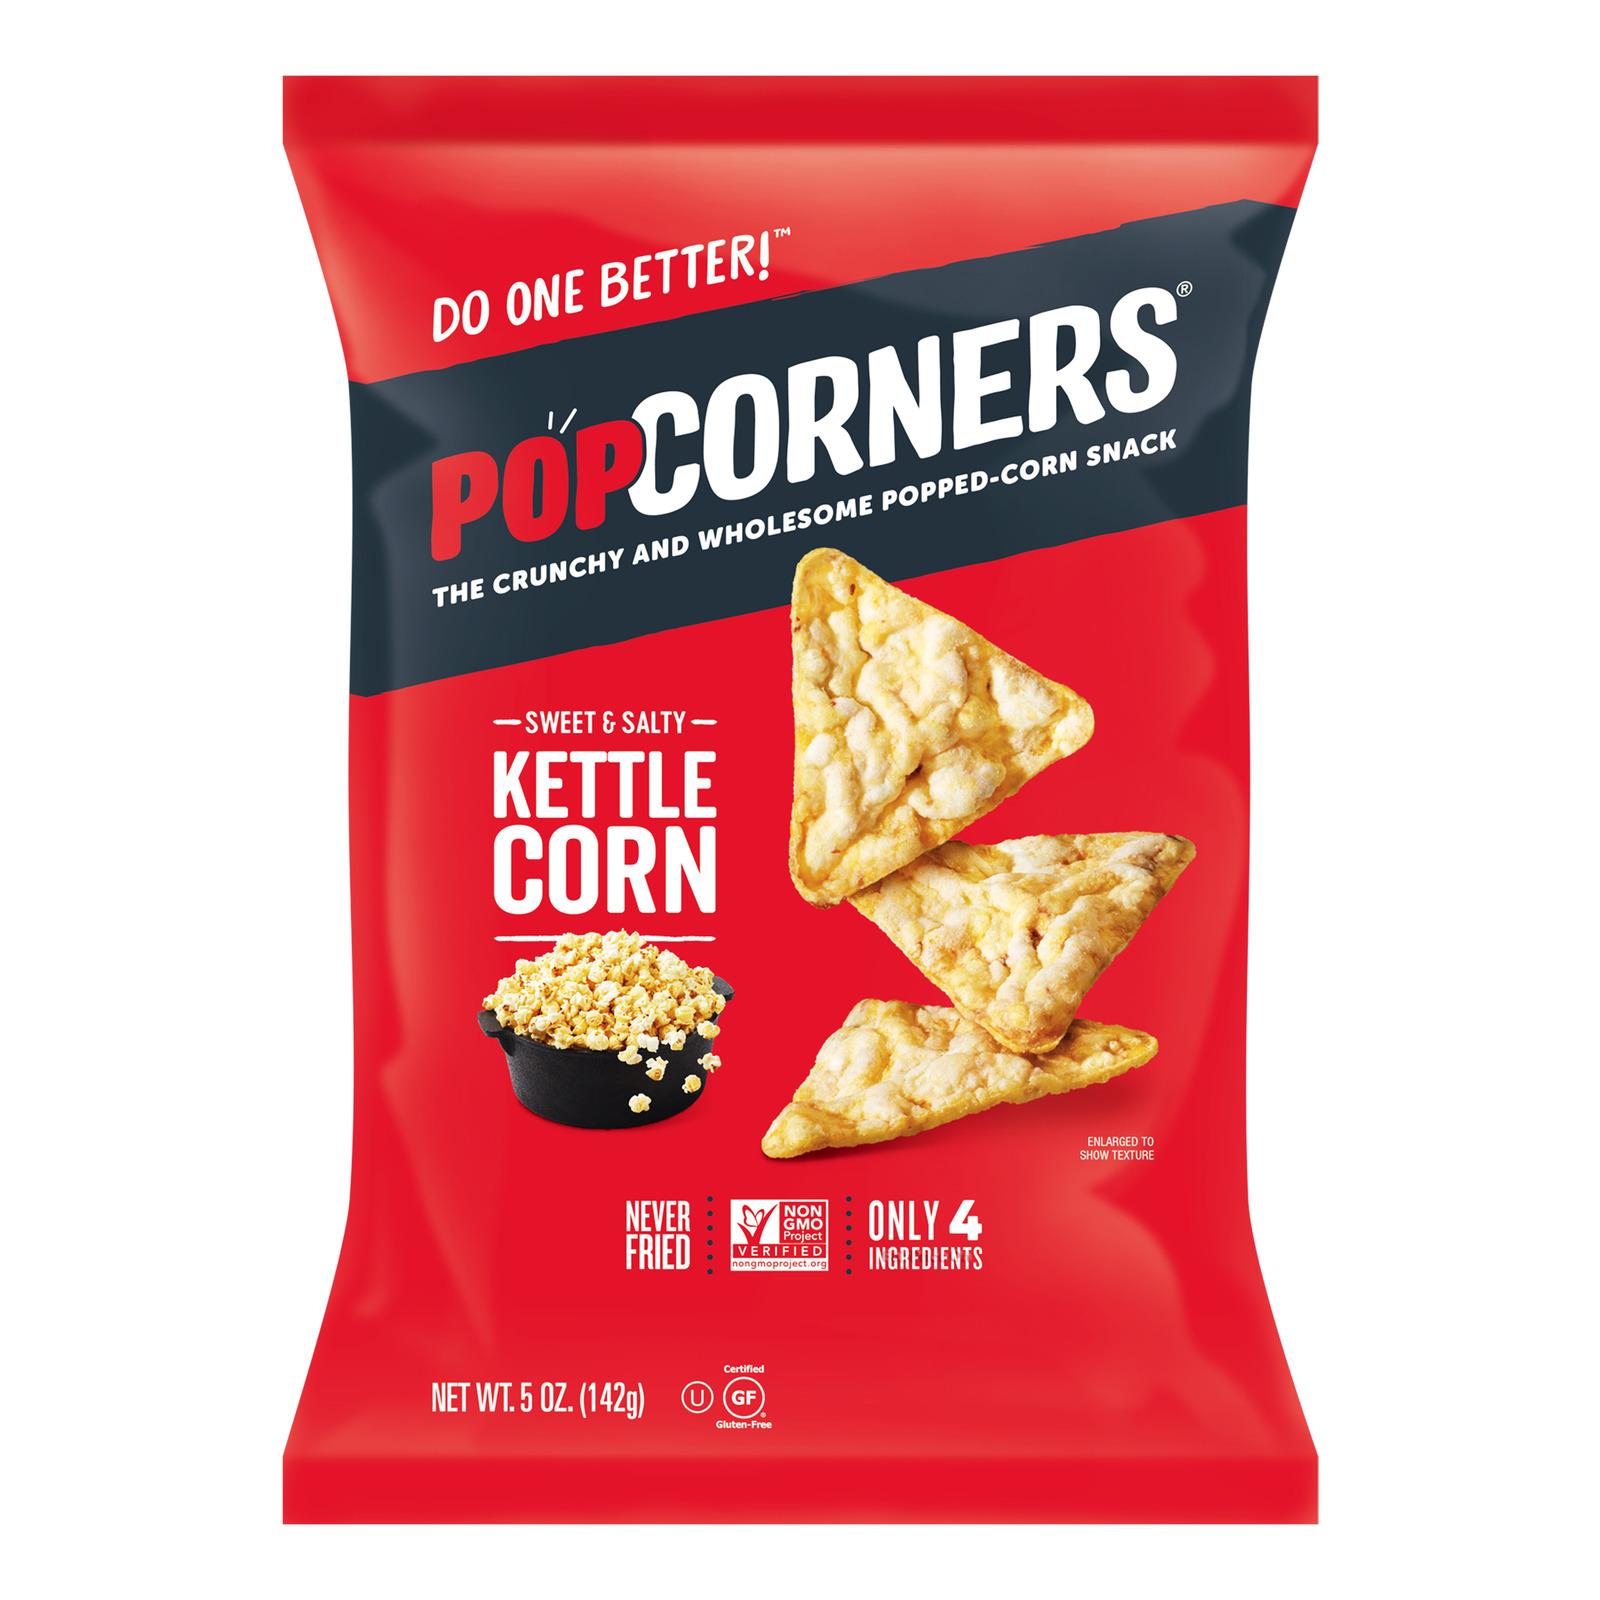 Popcorners Popped Corn Chips - Sweet & Salty